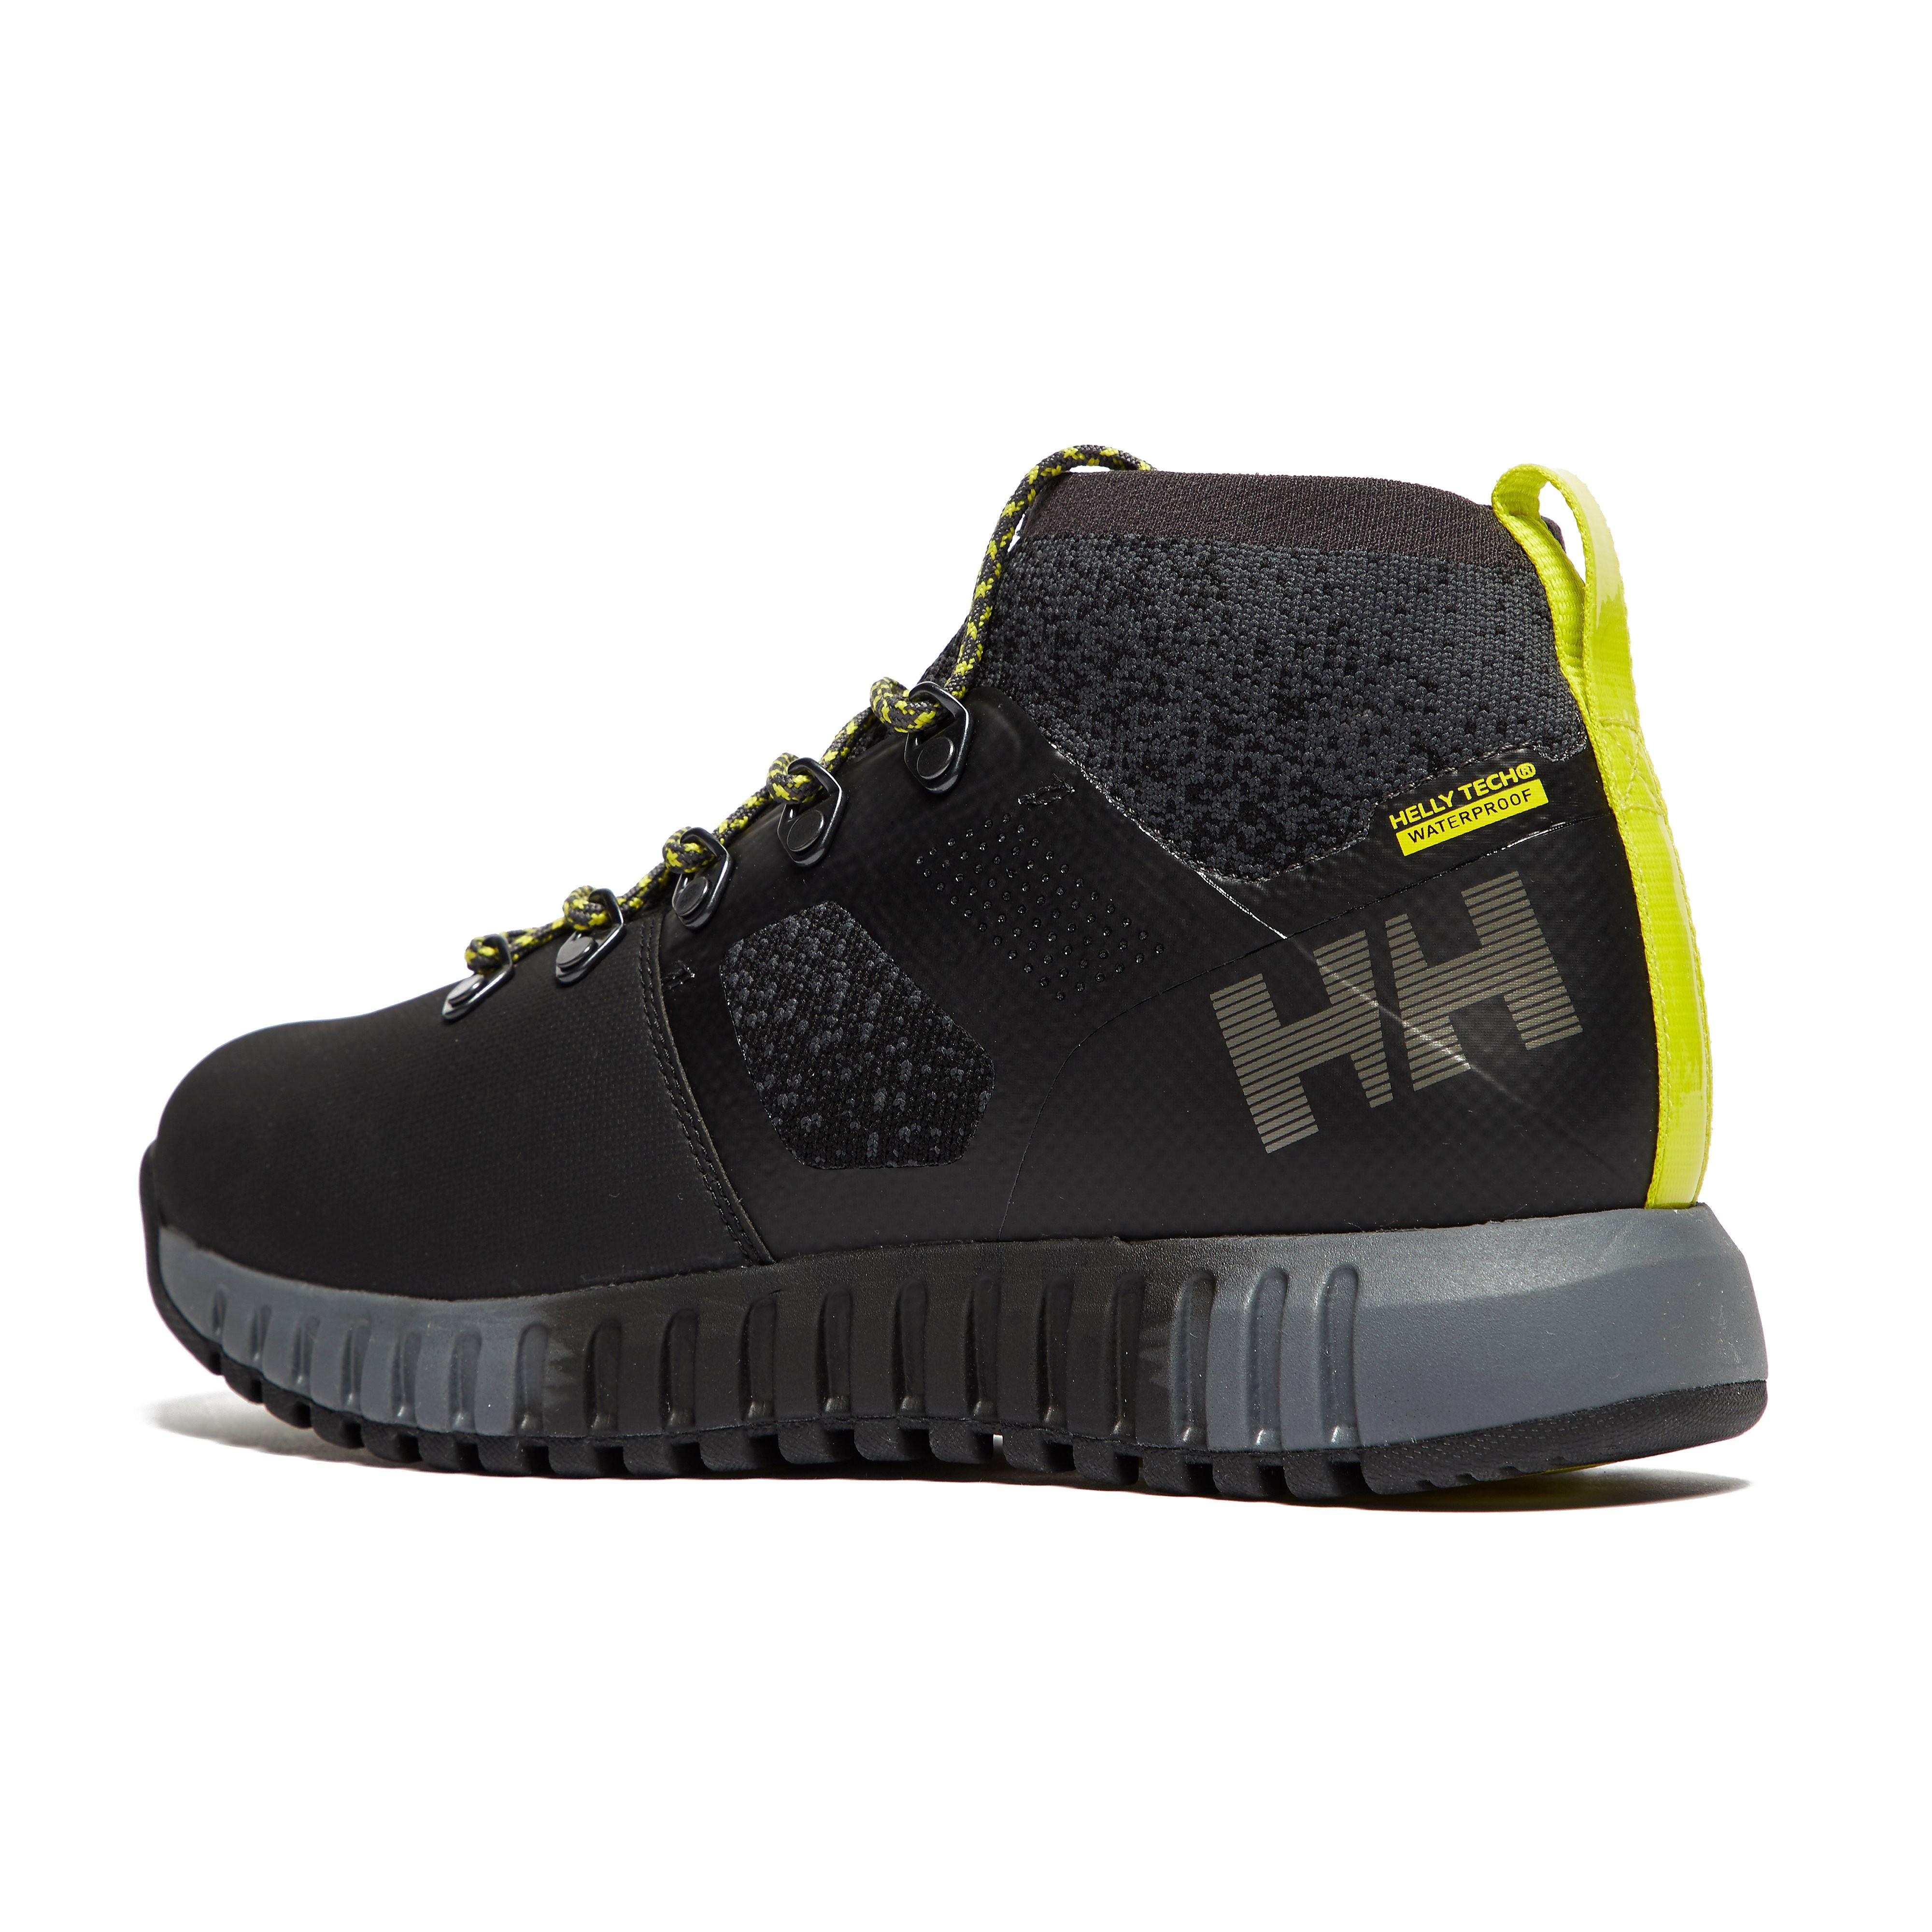 Helly Hansen Vanir Canter HT Men's Walking Shoes